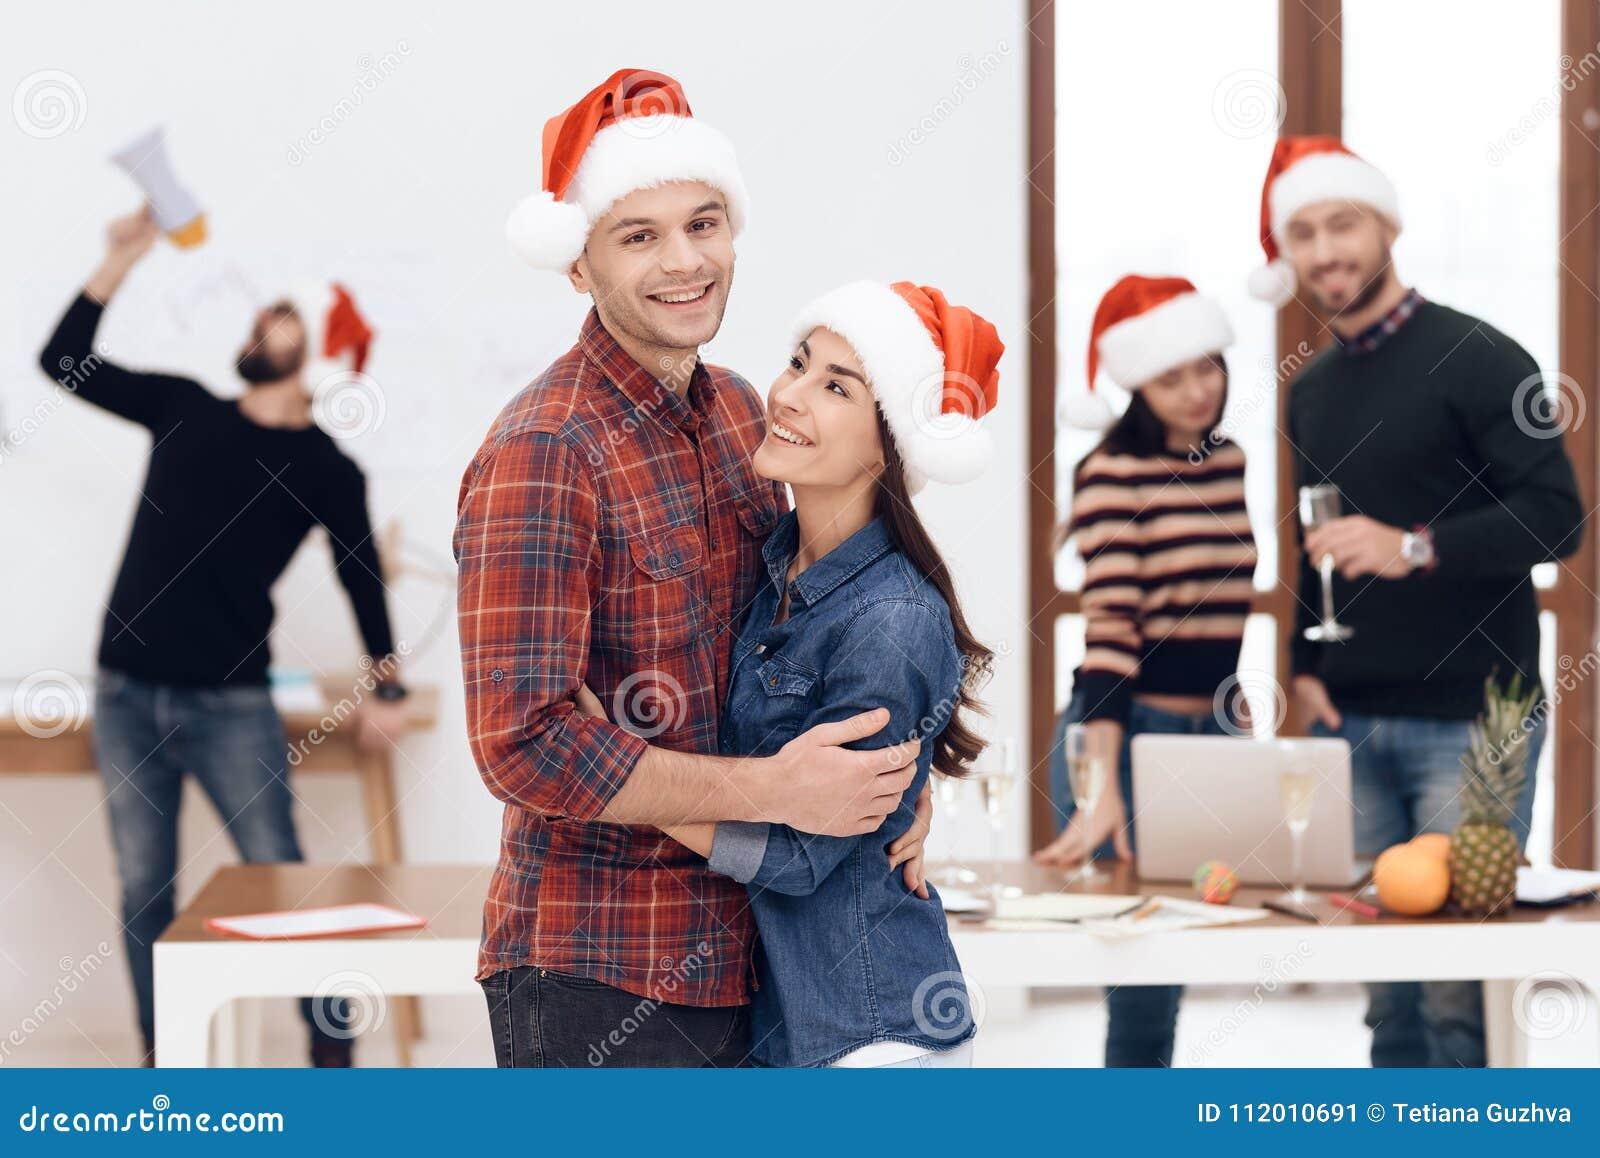 Молодая пара празднует на корпоративном торжестве